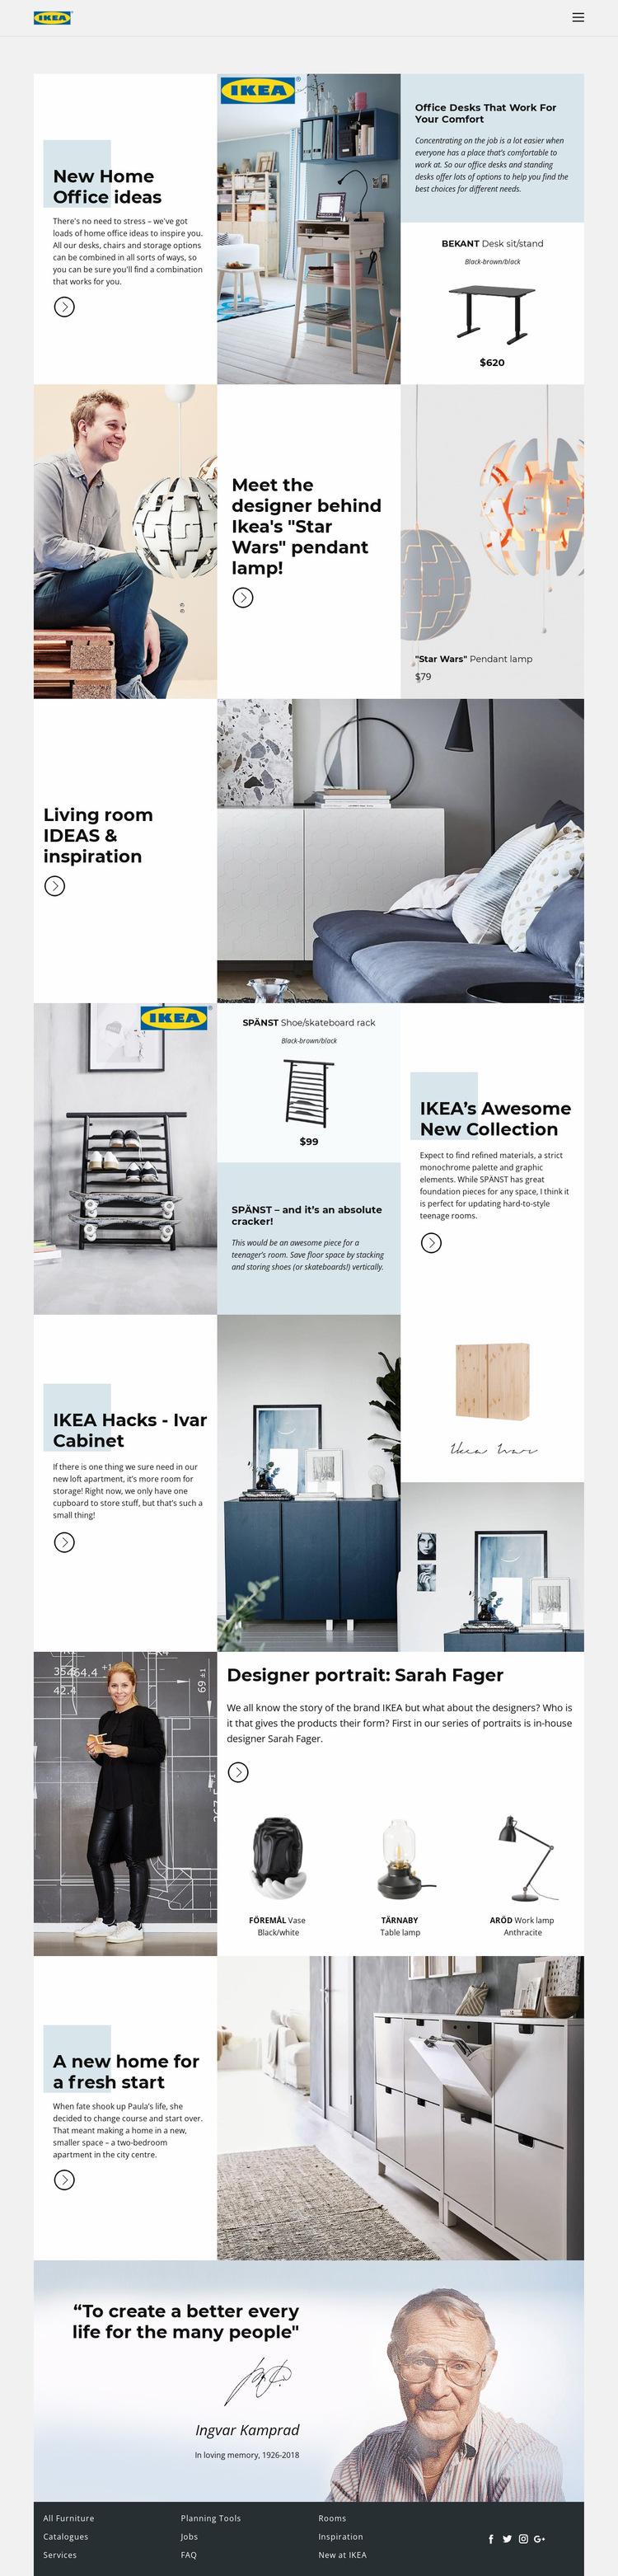 Inspiration from IKEA Website Builder